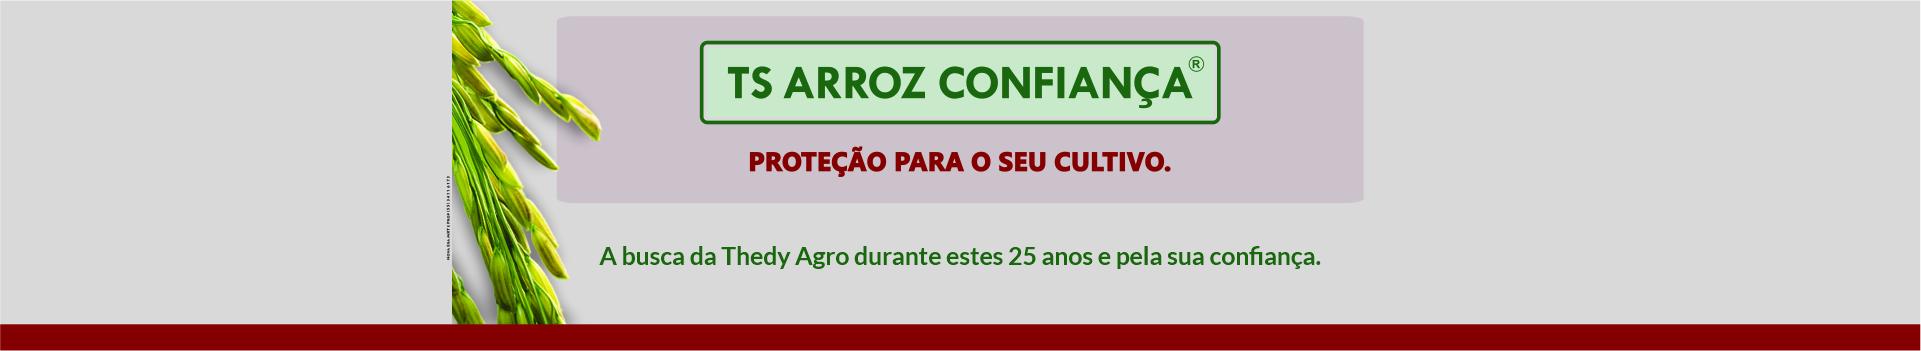 THEDYAGRO_TS_ARROZ-CONFIANCA-03-1